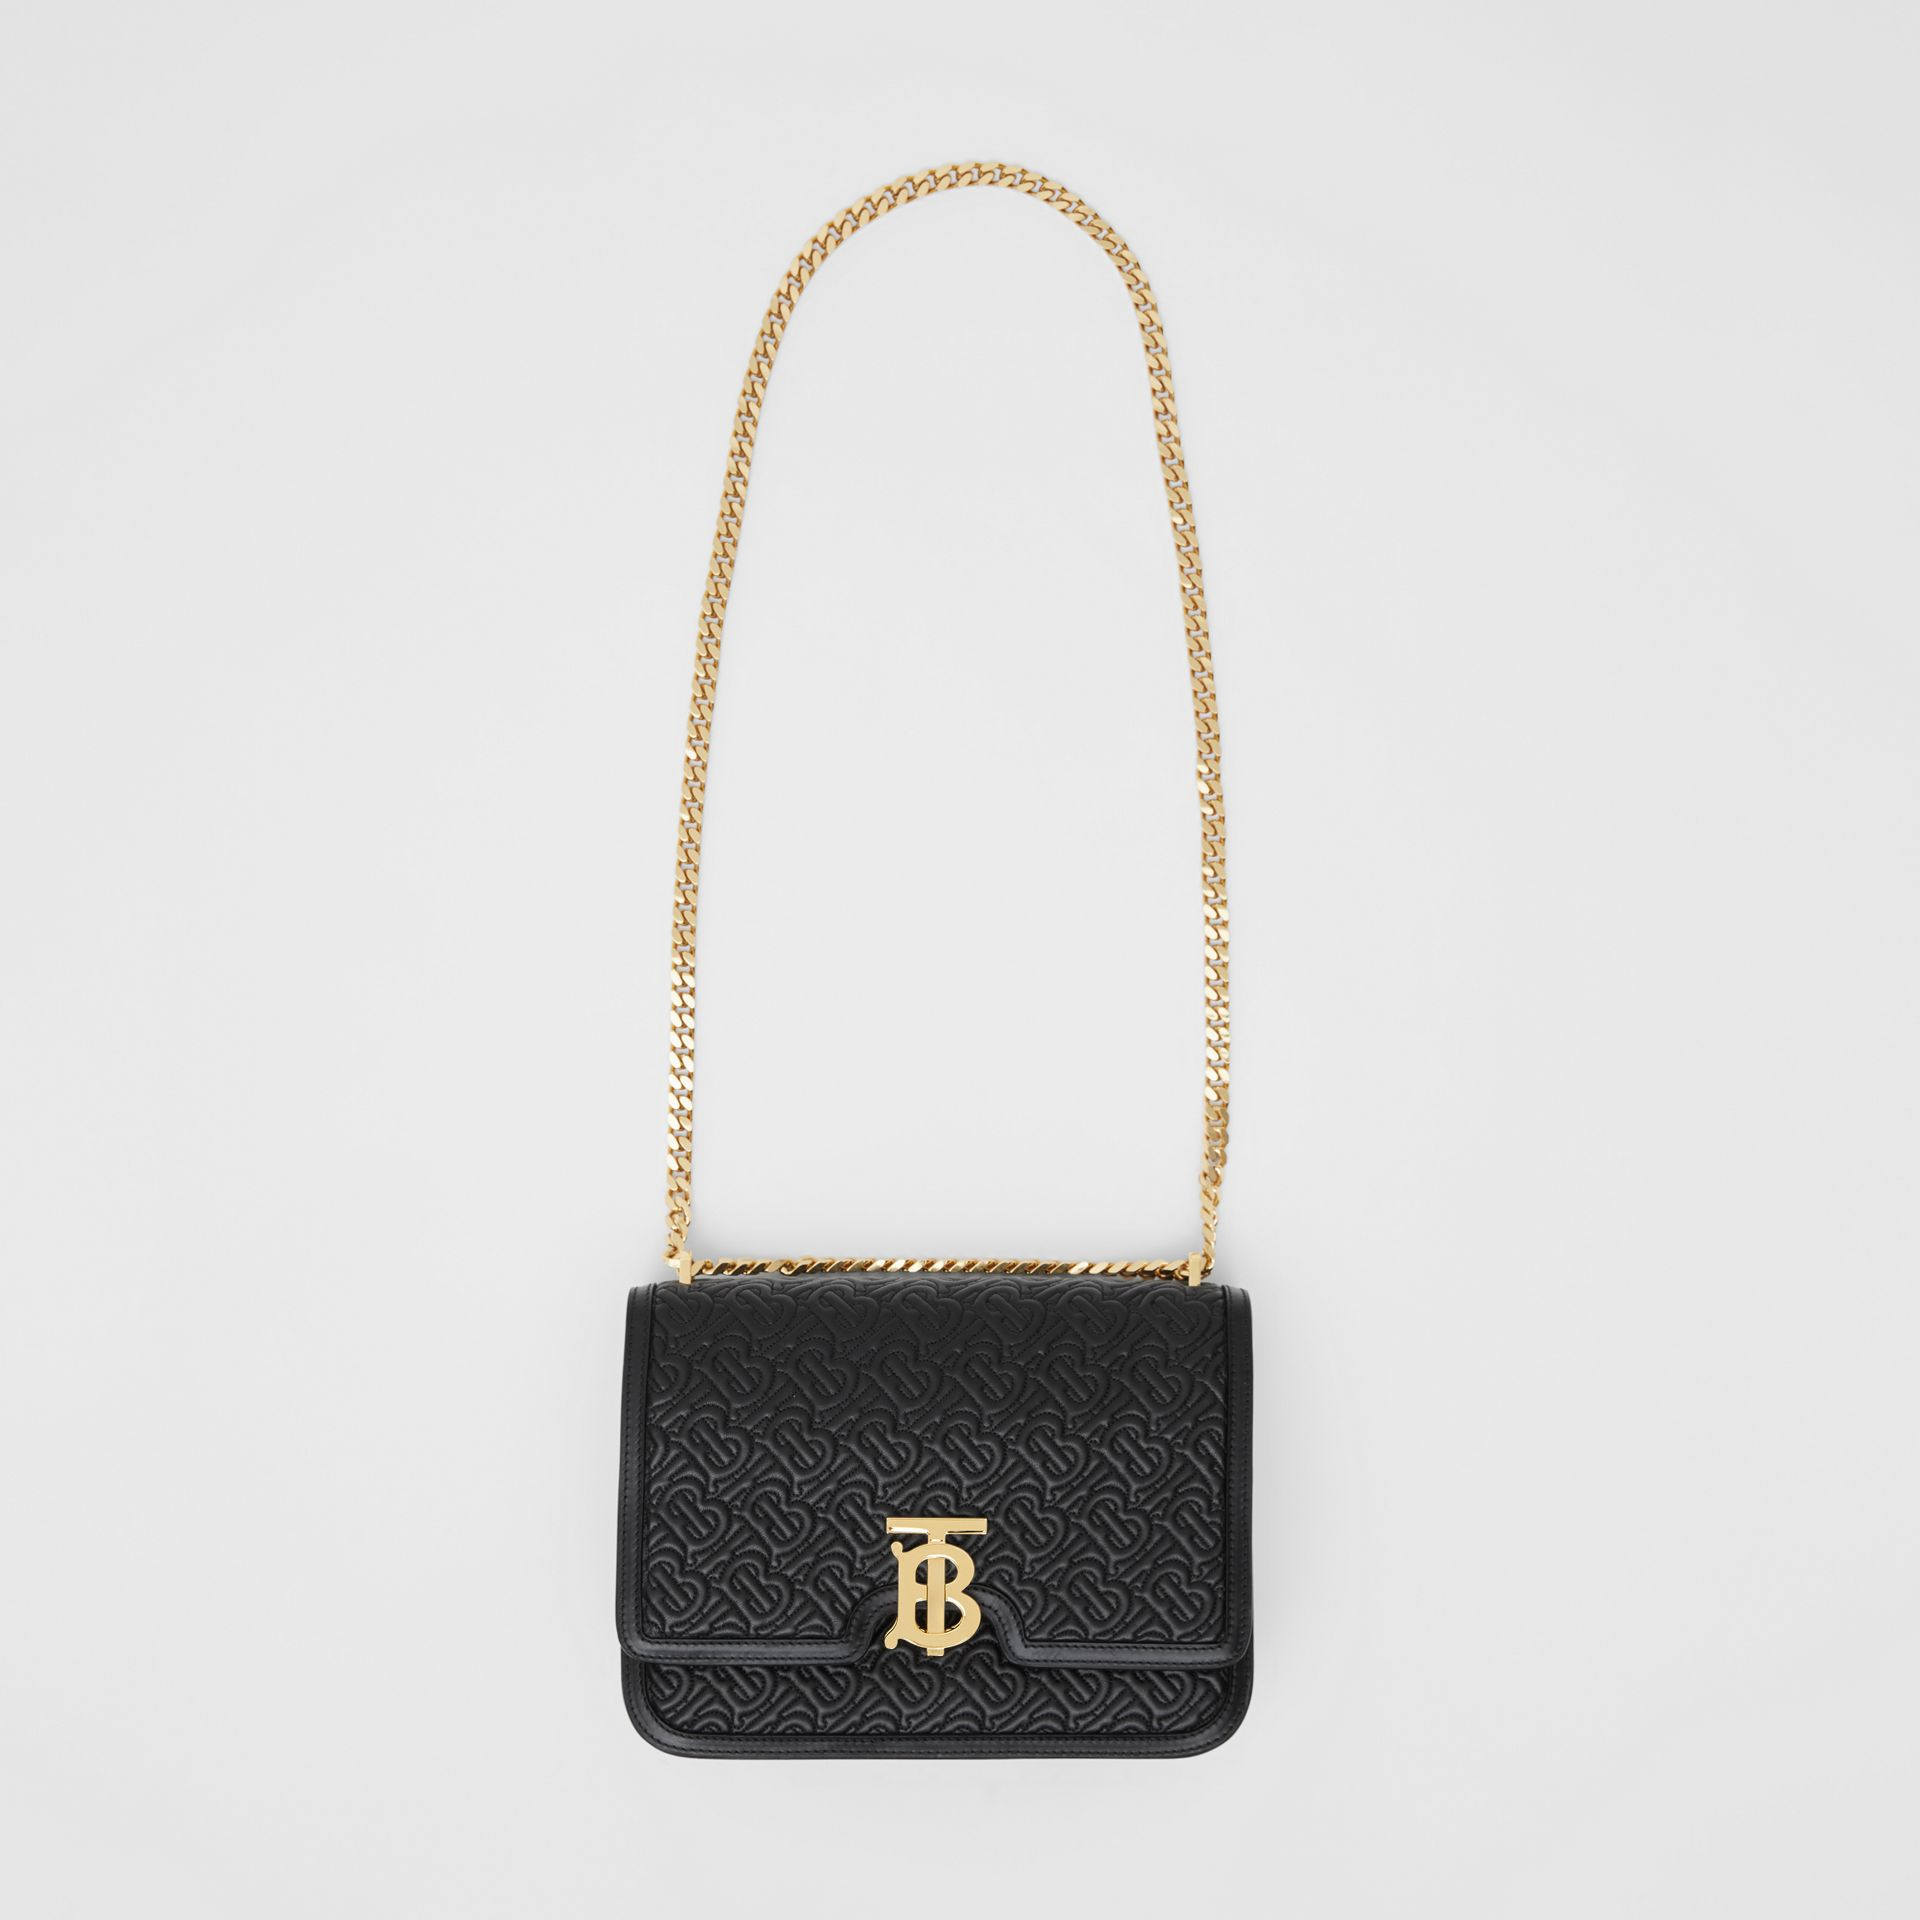 Medium Quilted Monogram Lambskin TB Bag in Black - Women | Burberry - gallery image 2